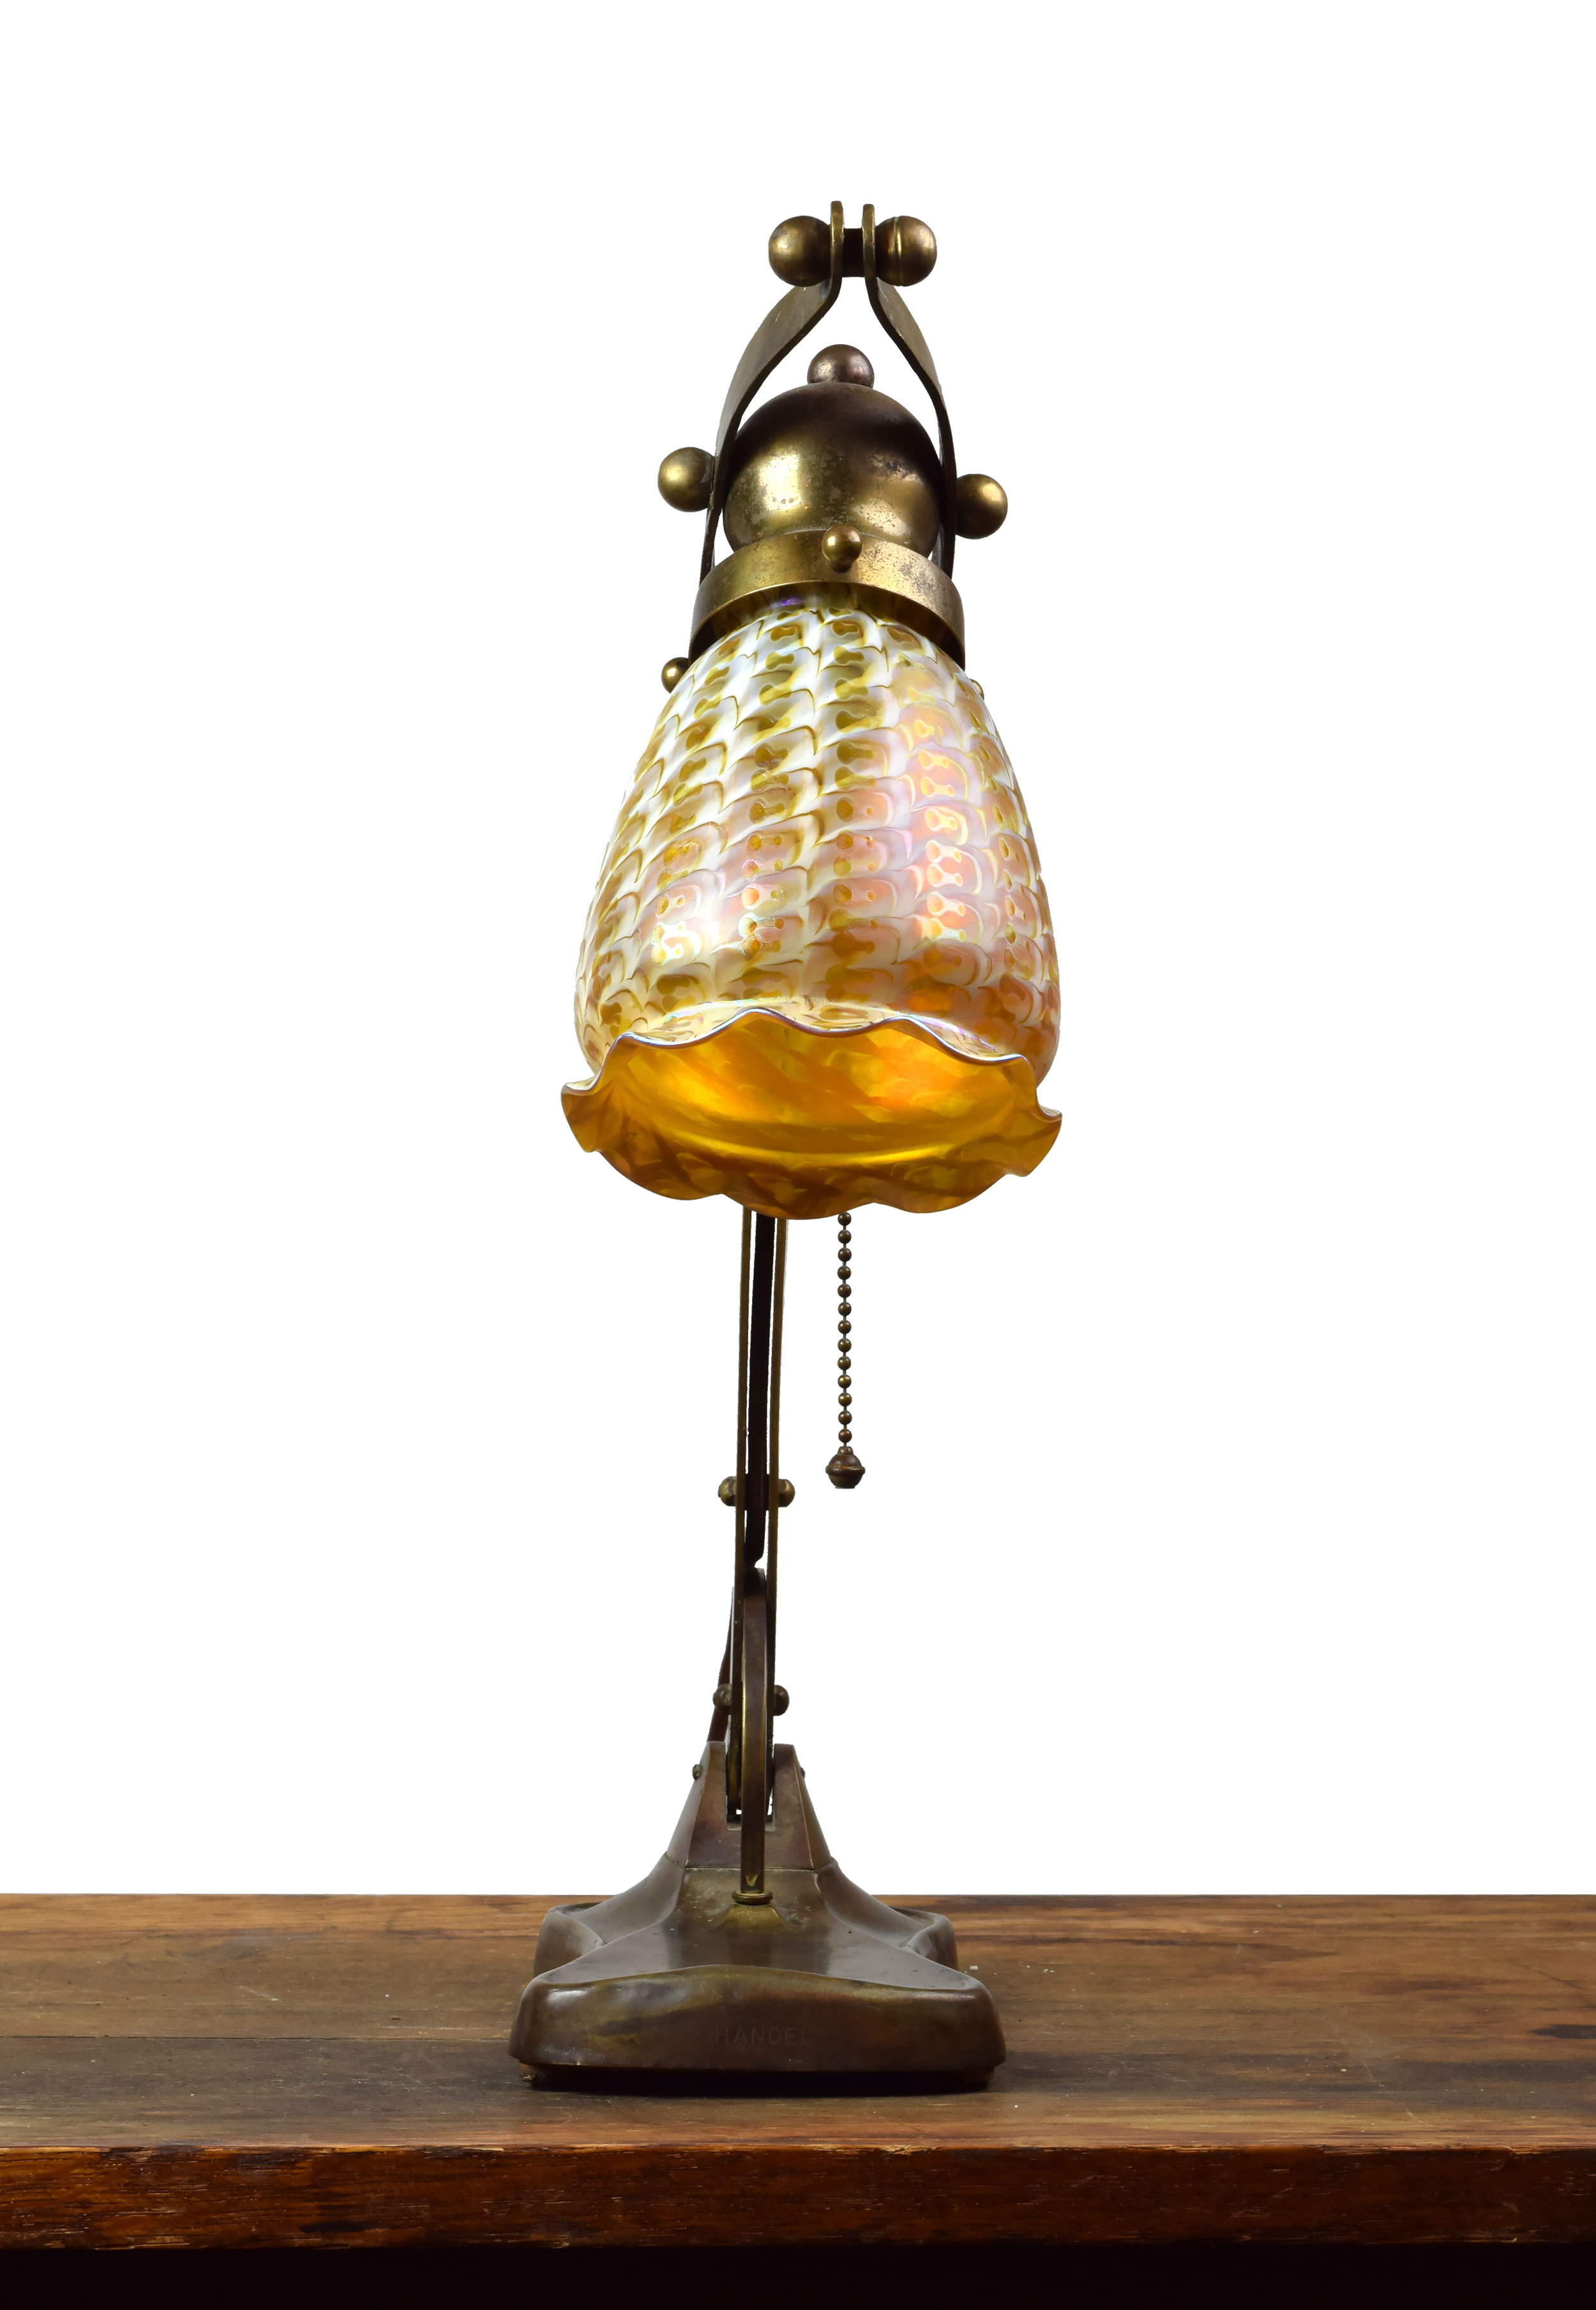 47195-handel-table-lamp-front-view.jpg